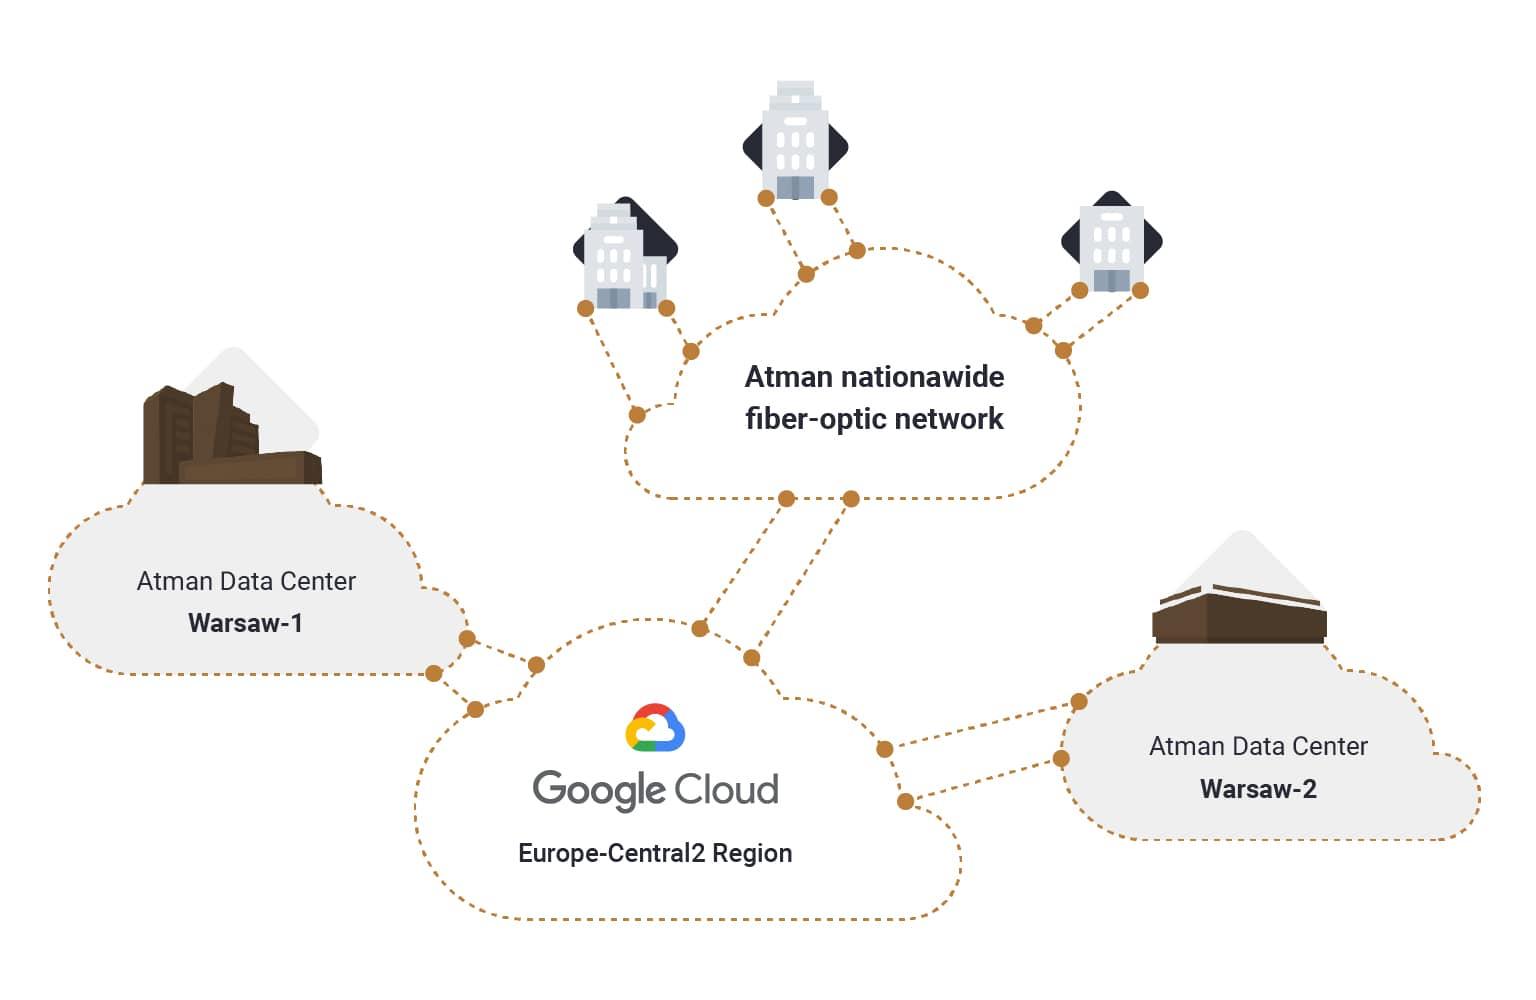 Atman Google Connect scheme